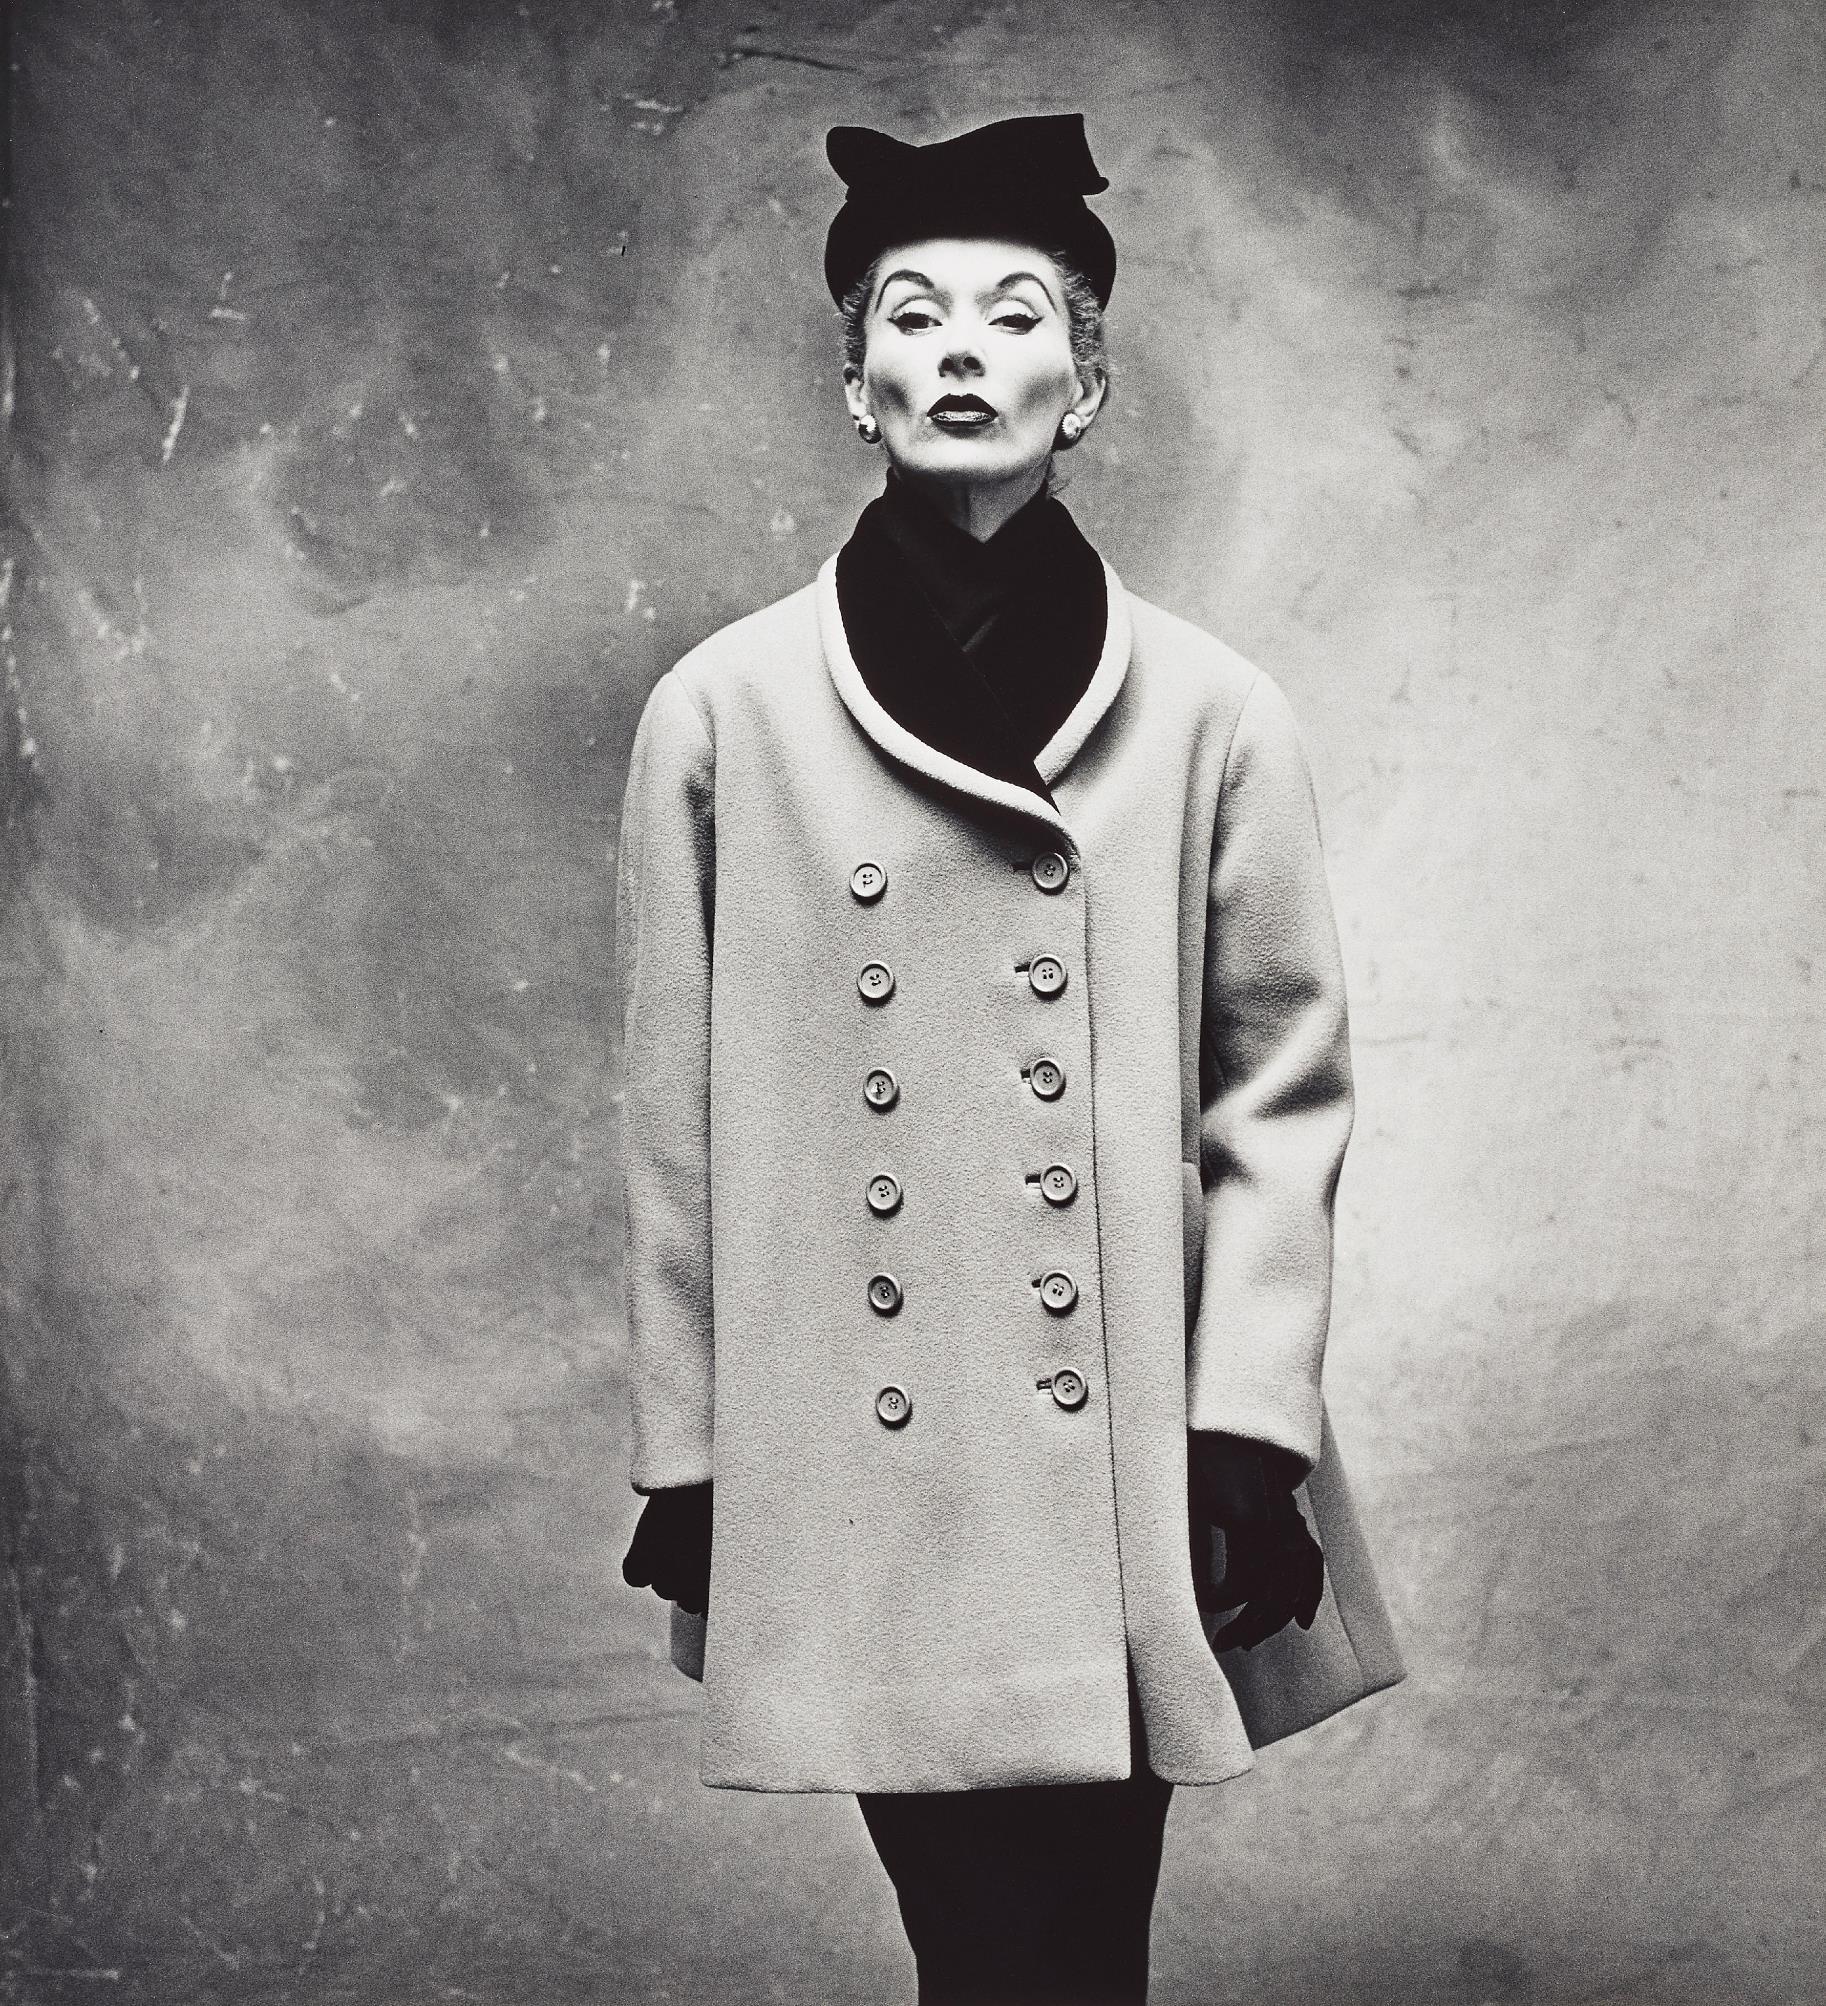 Irving Penn-Balenciaga 'Little Great' Coat (Lisa Fonssagrives-Penn), Paris-1950